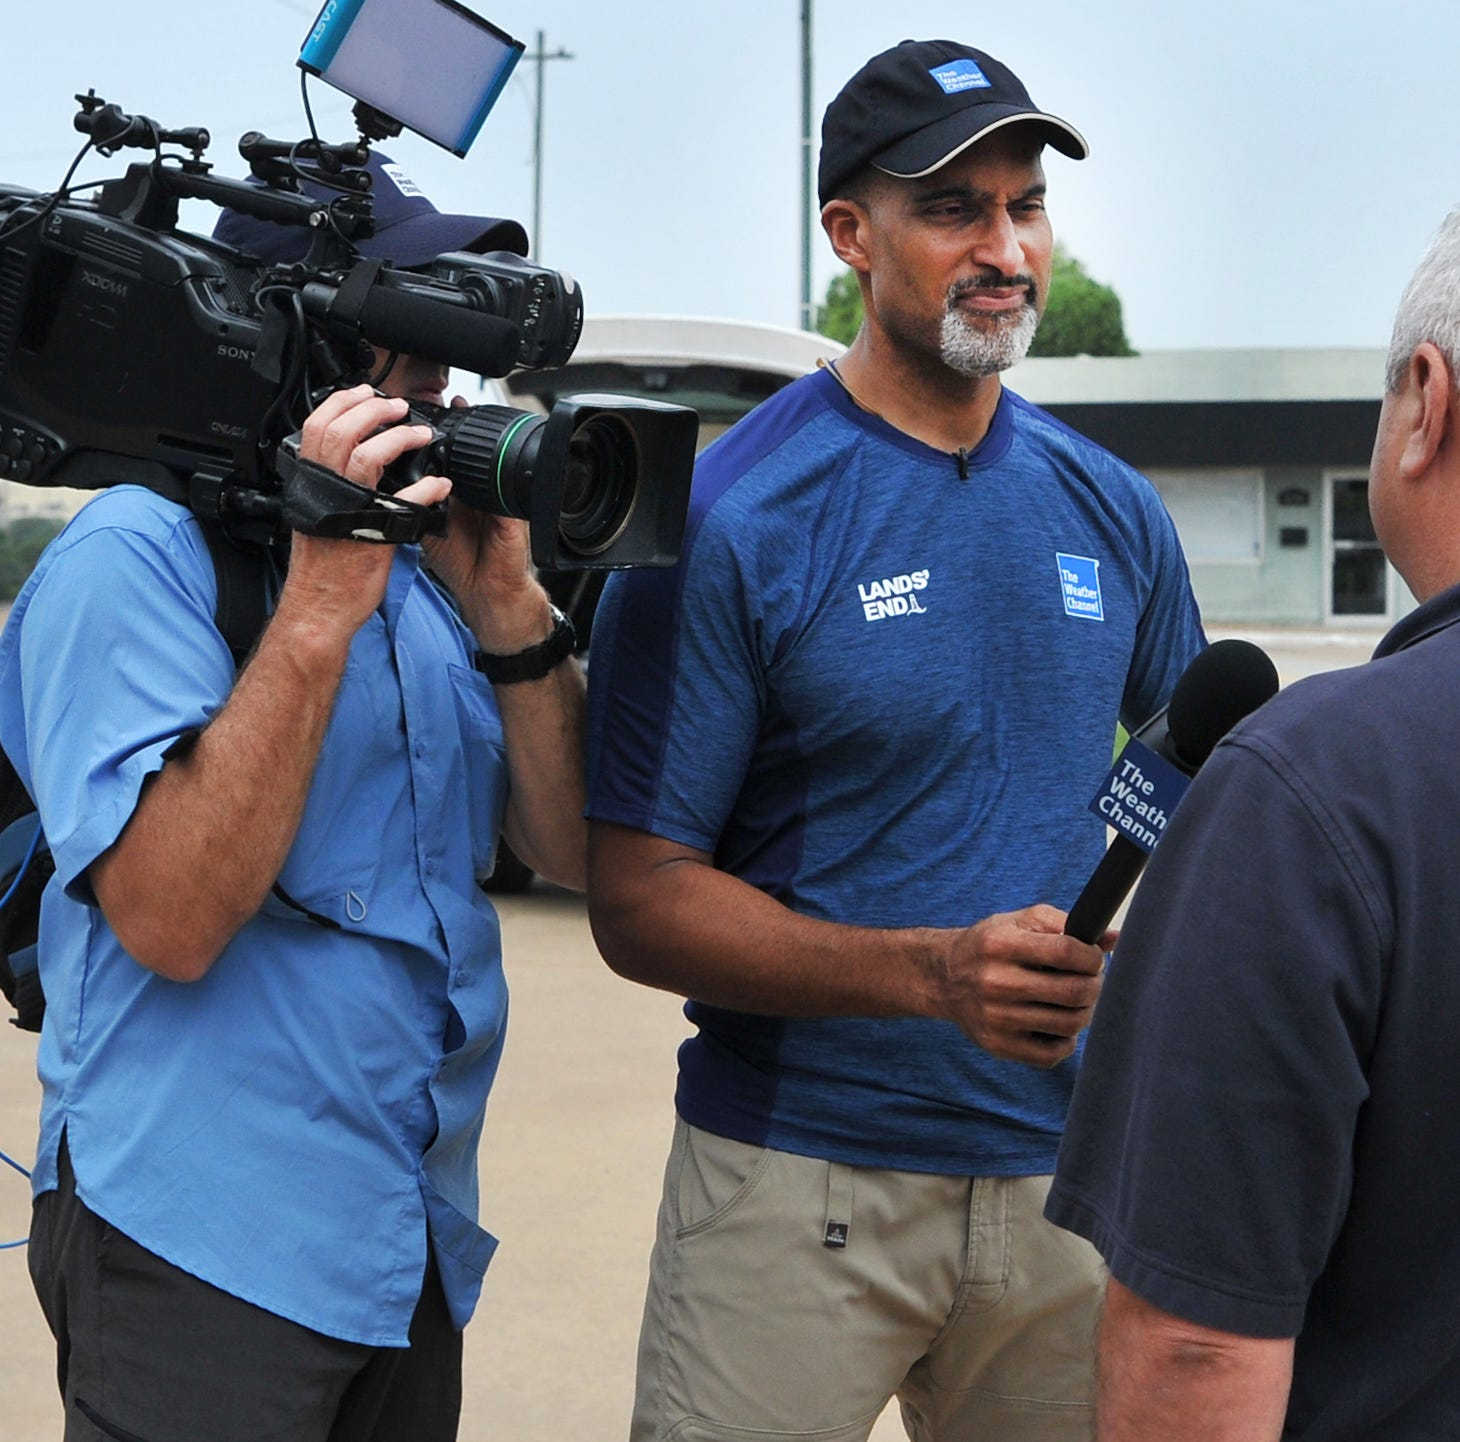 Storms bring more rain than twisters to Wichita Falls